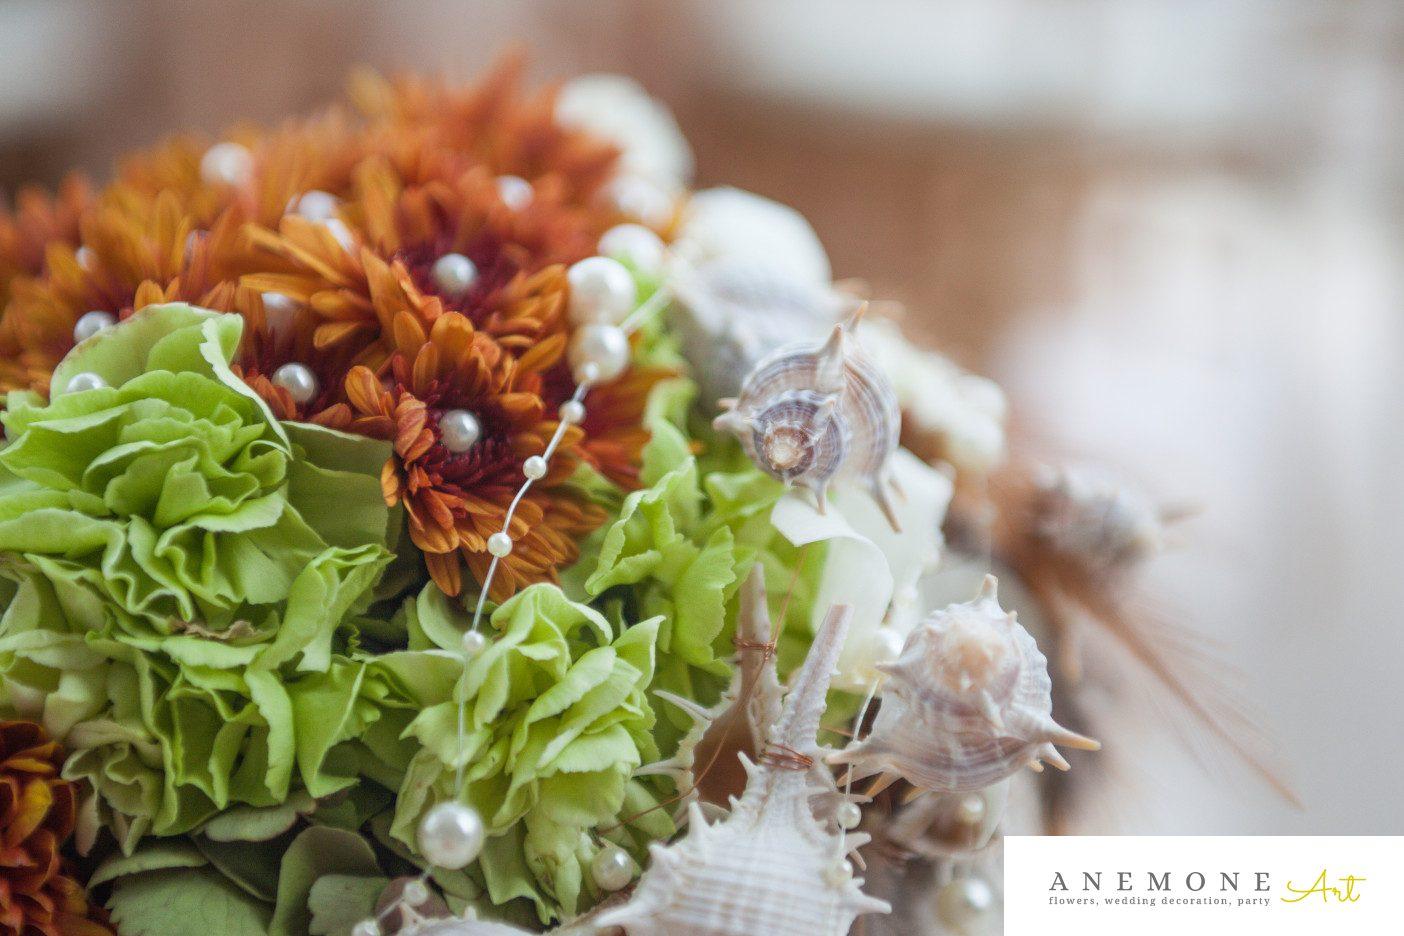 Poza, foto cu Flori de nunta buchet mireasa, curgator, maro, pene, perle, scoici, verde in Arad, Timisoara, Oradea (wedding flowers, bouquets) nunta Arad, Timisoara, Oradea